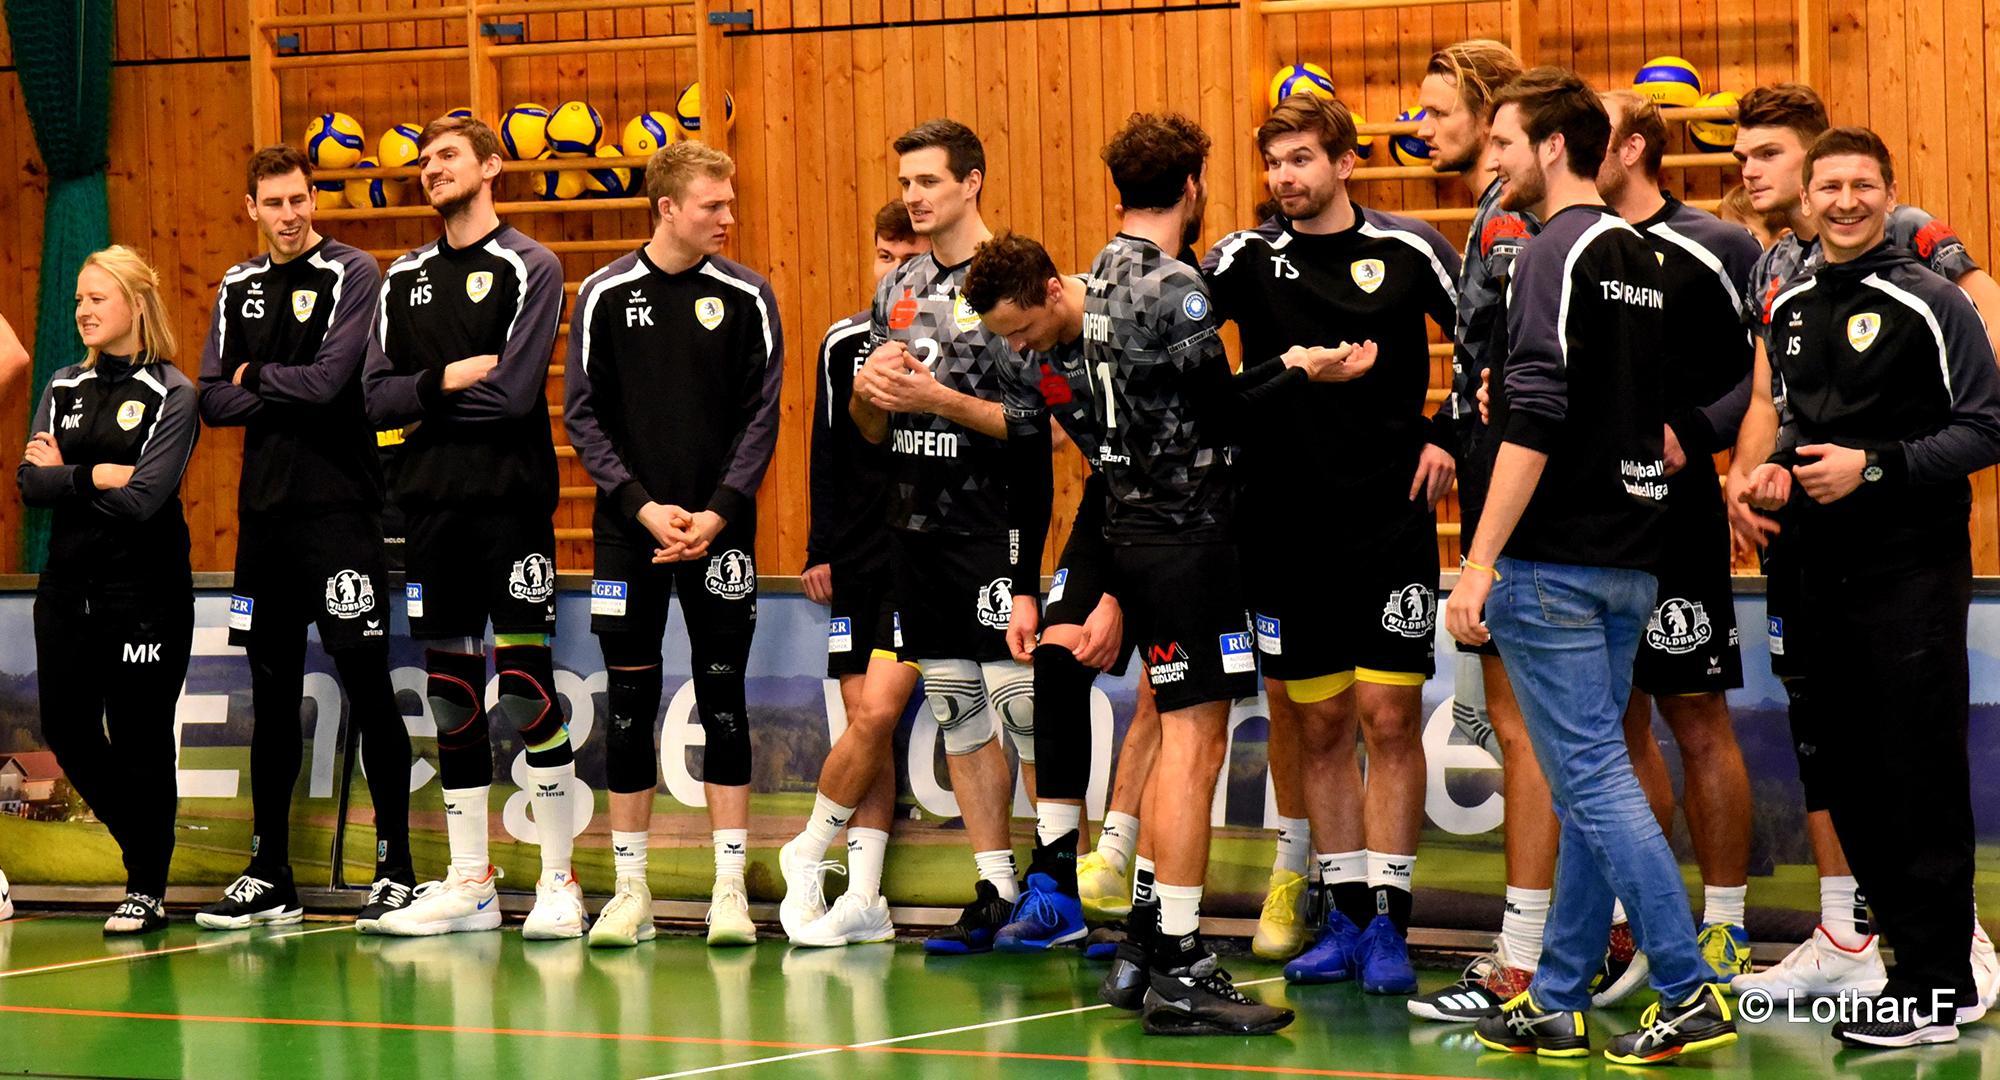 Rothmoser Sponsoring des TSV Volleyball in Grafing